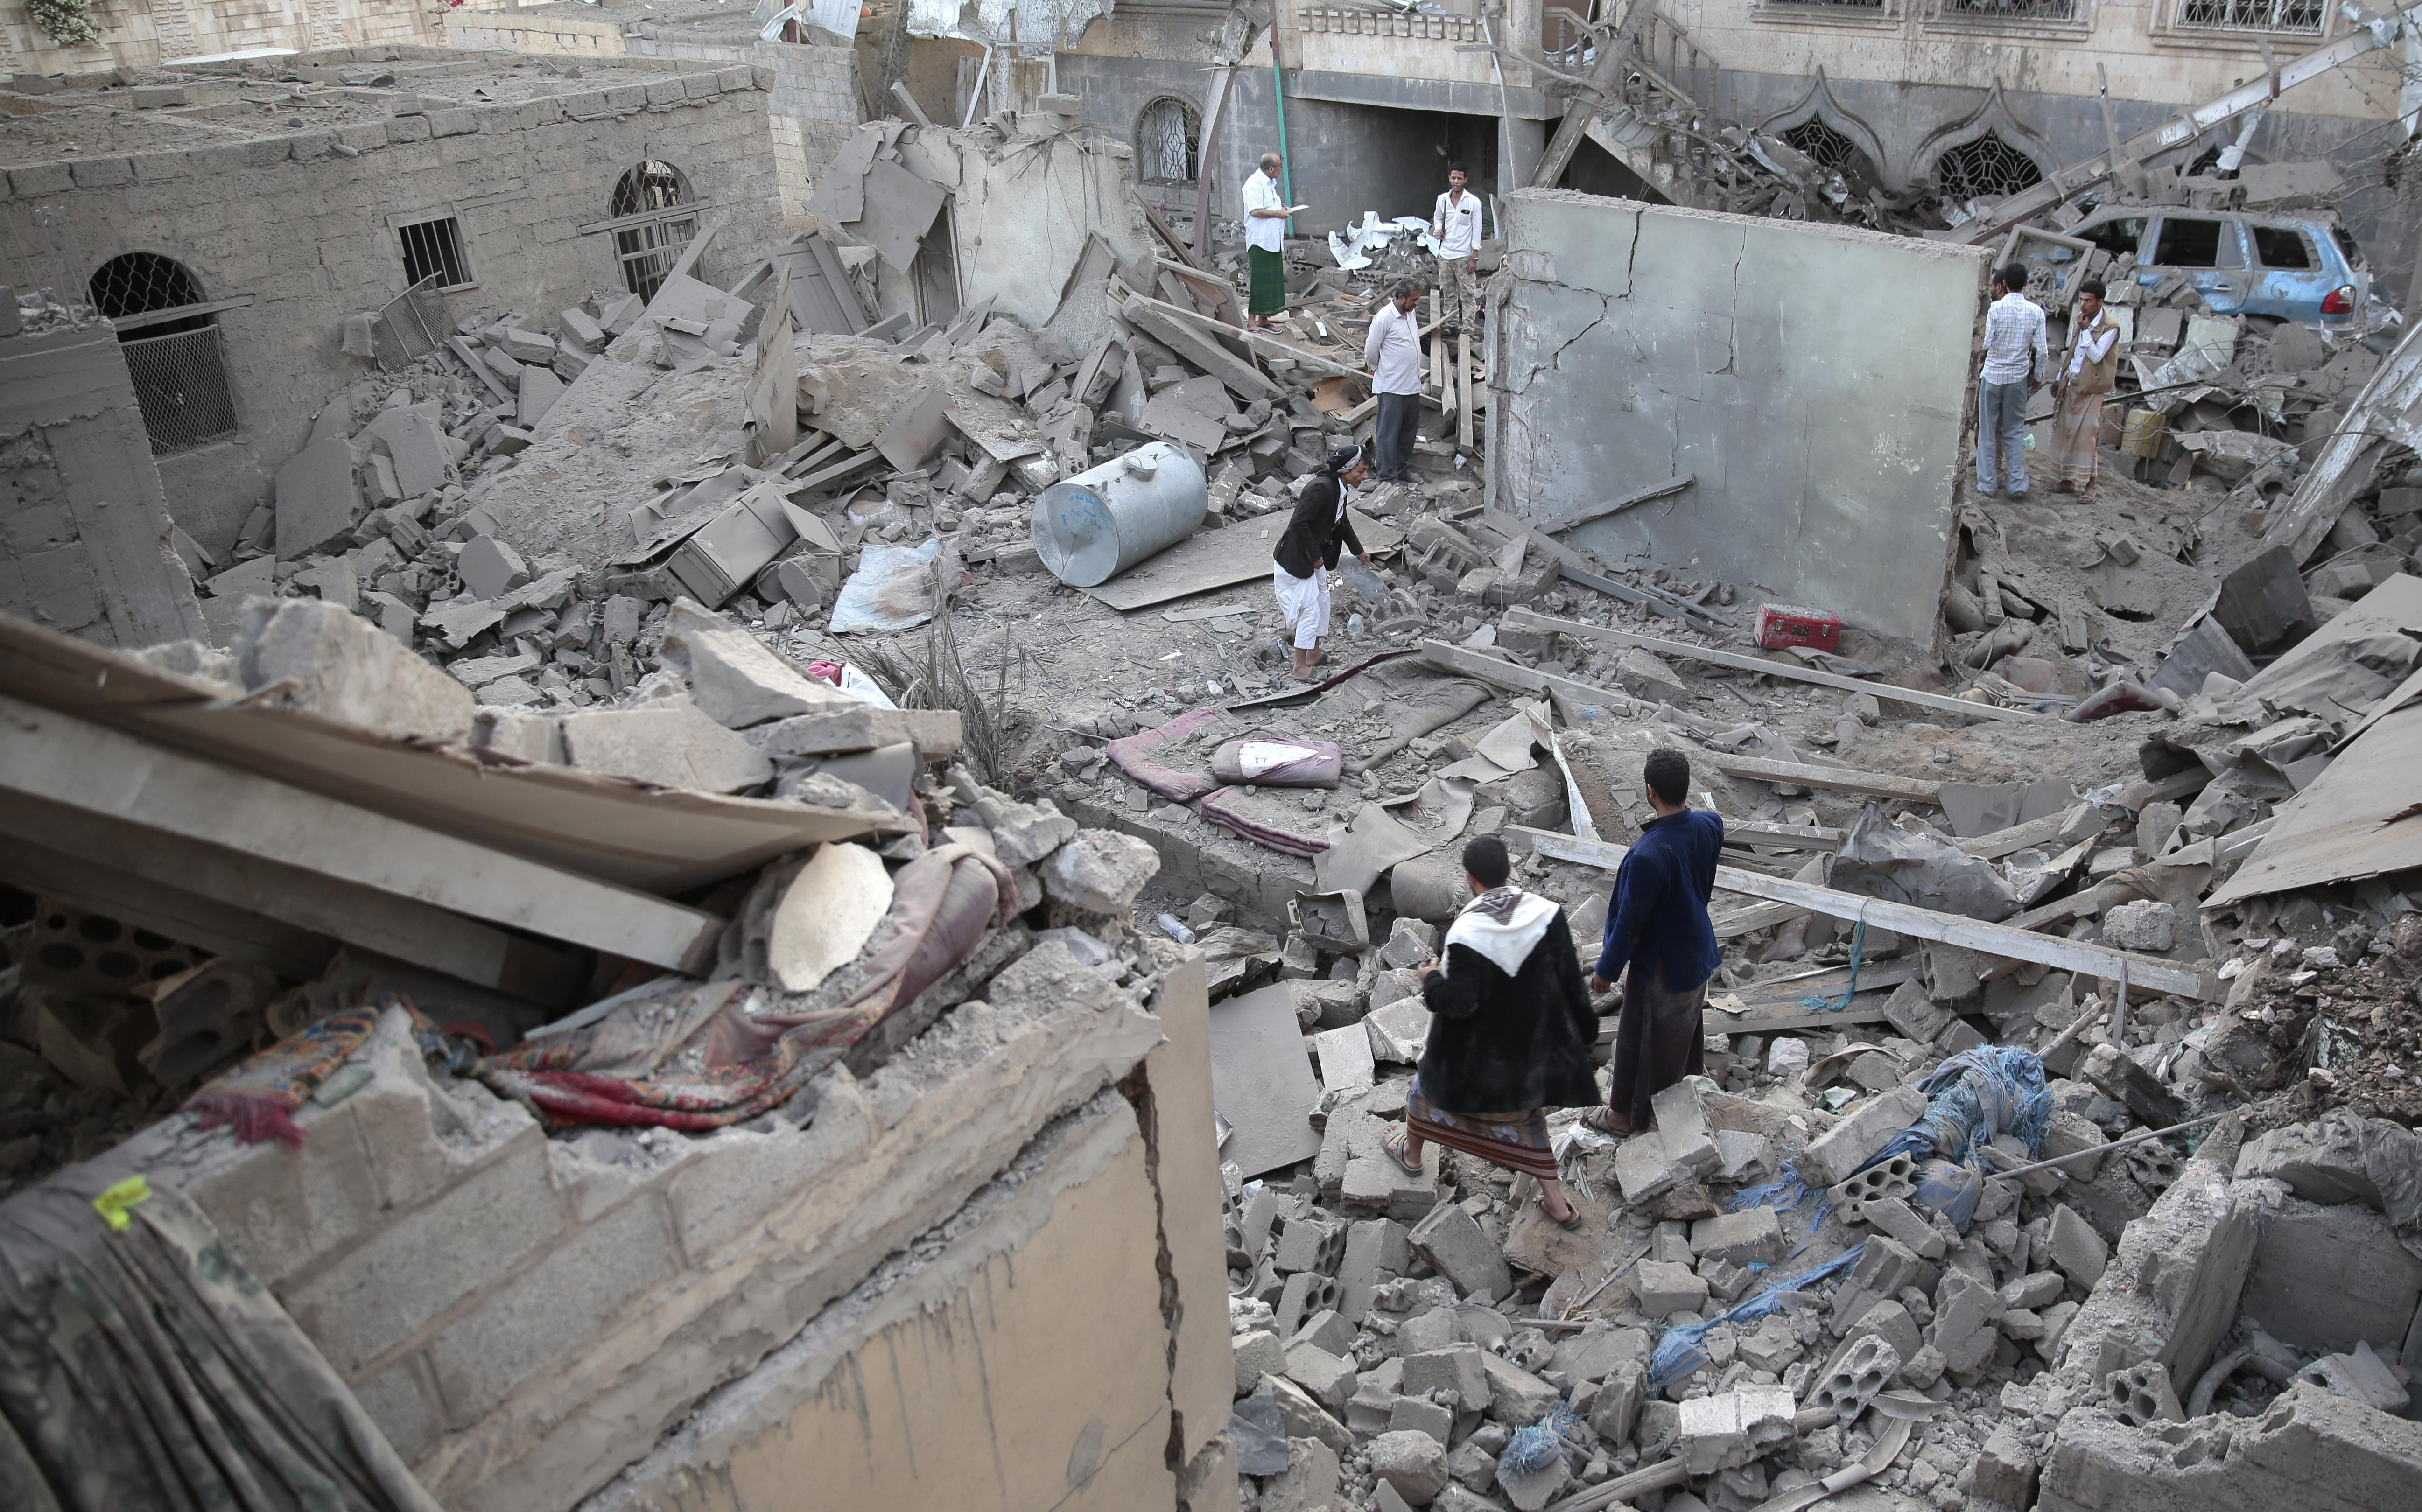 Hani Al-Ansi/picture-alliance/dpa/AP Images